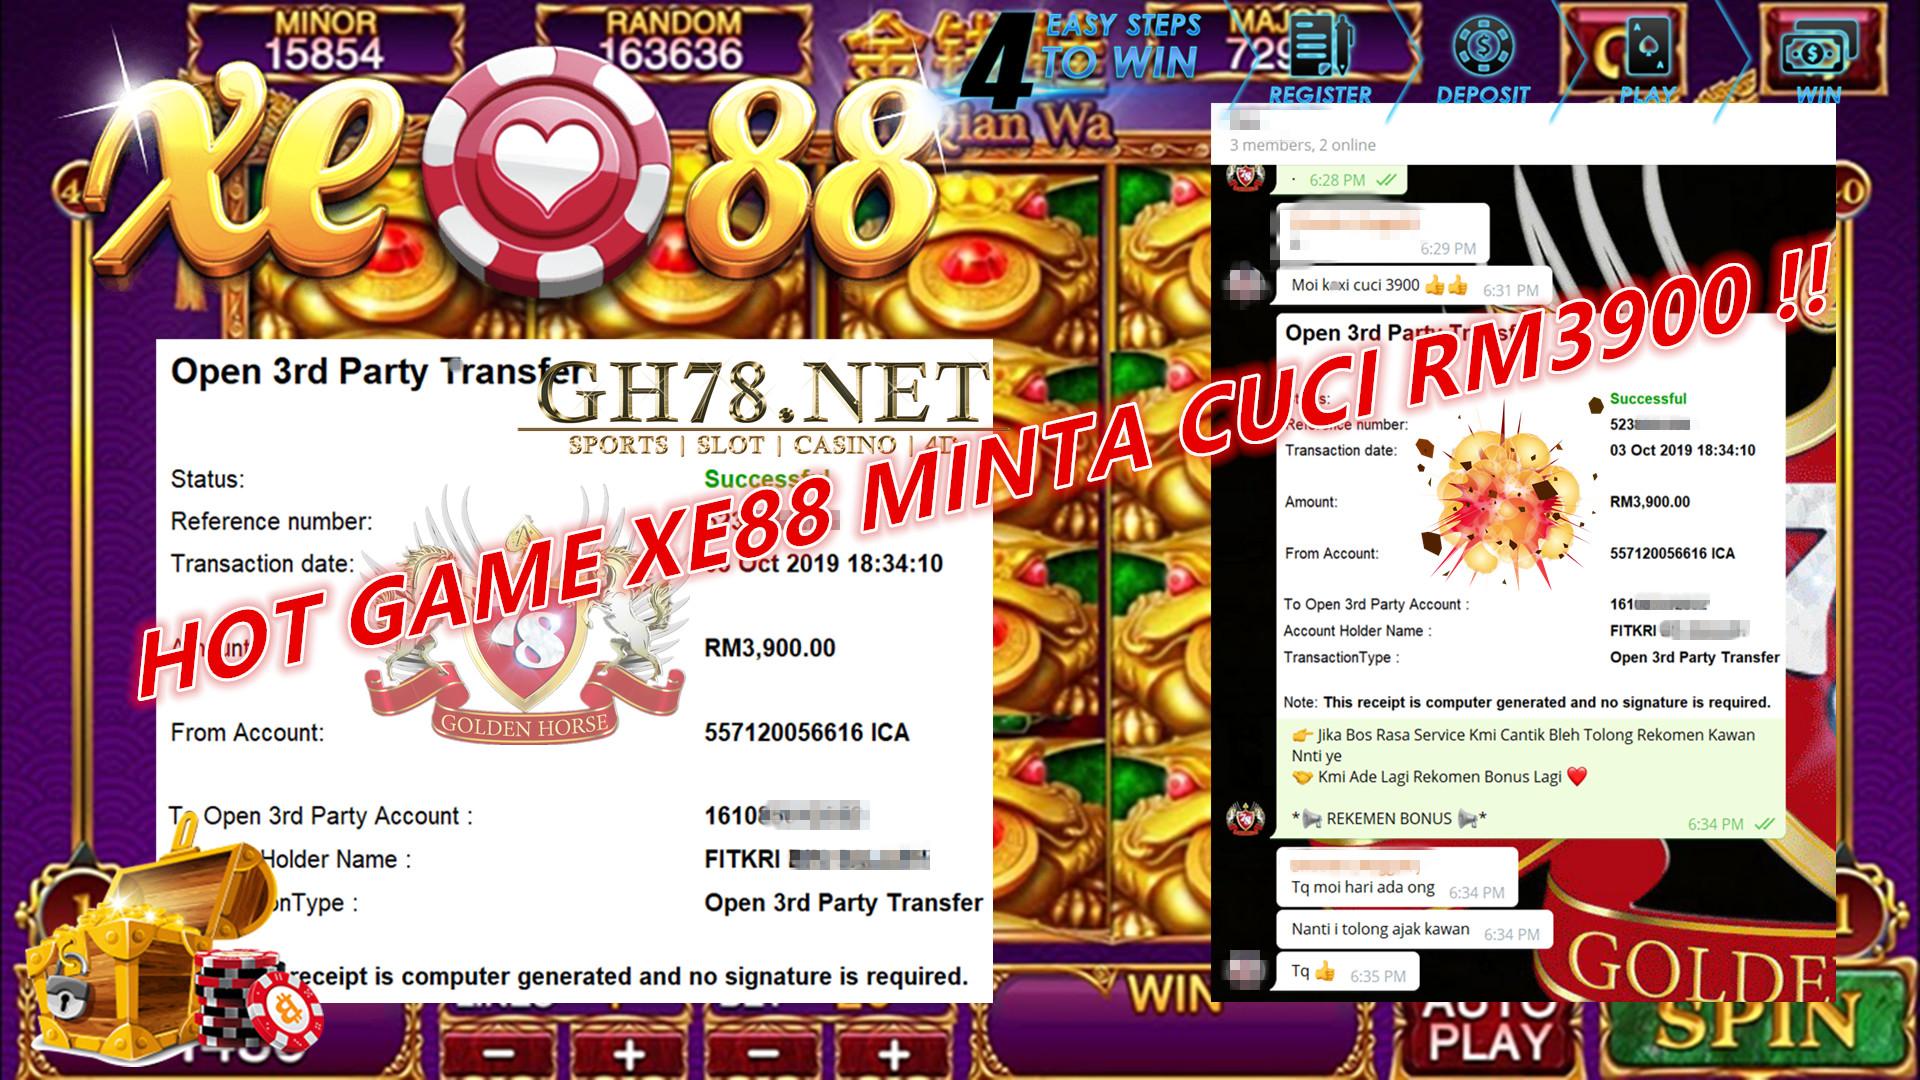 XE88 MINTA CUCI LAGI RM3900 !!